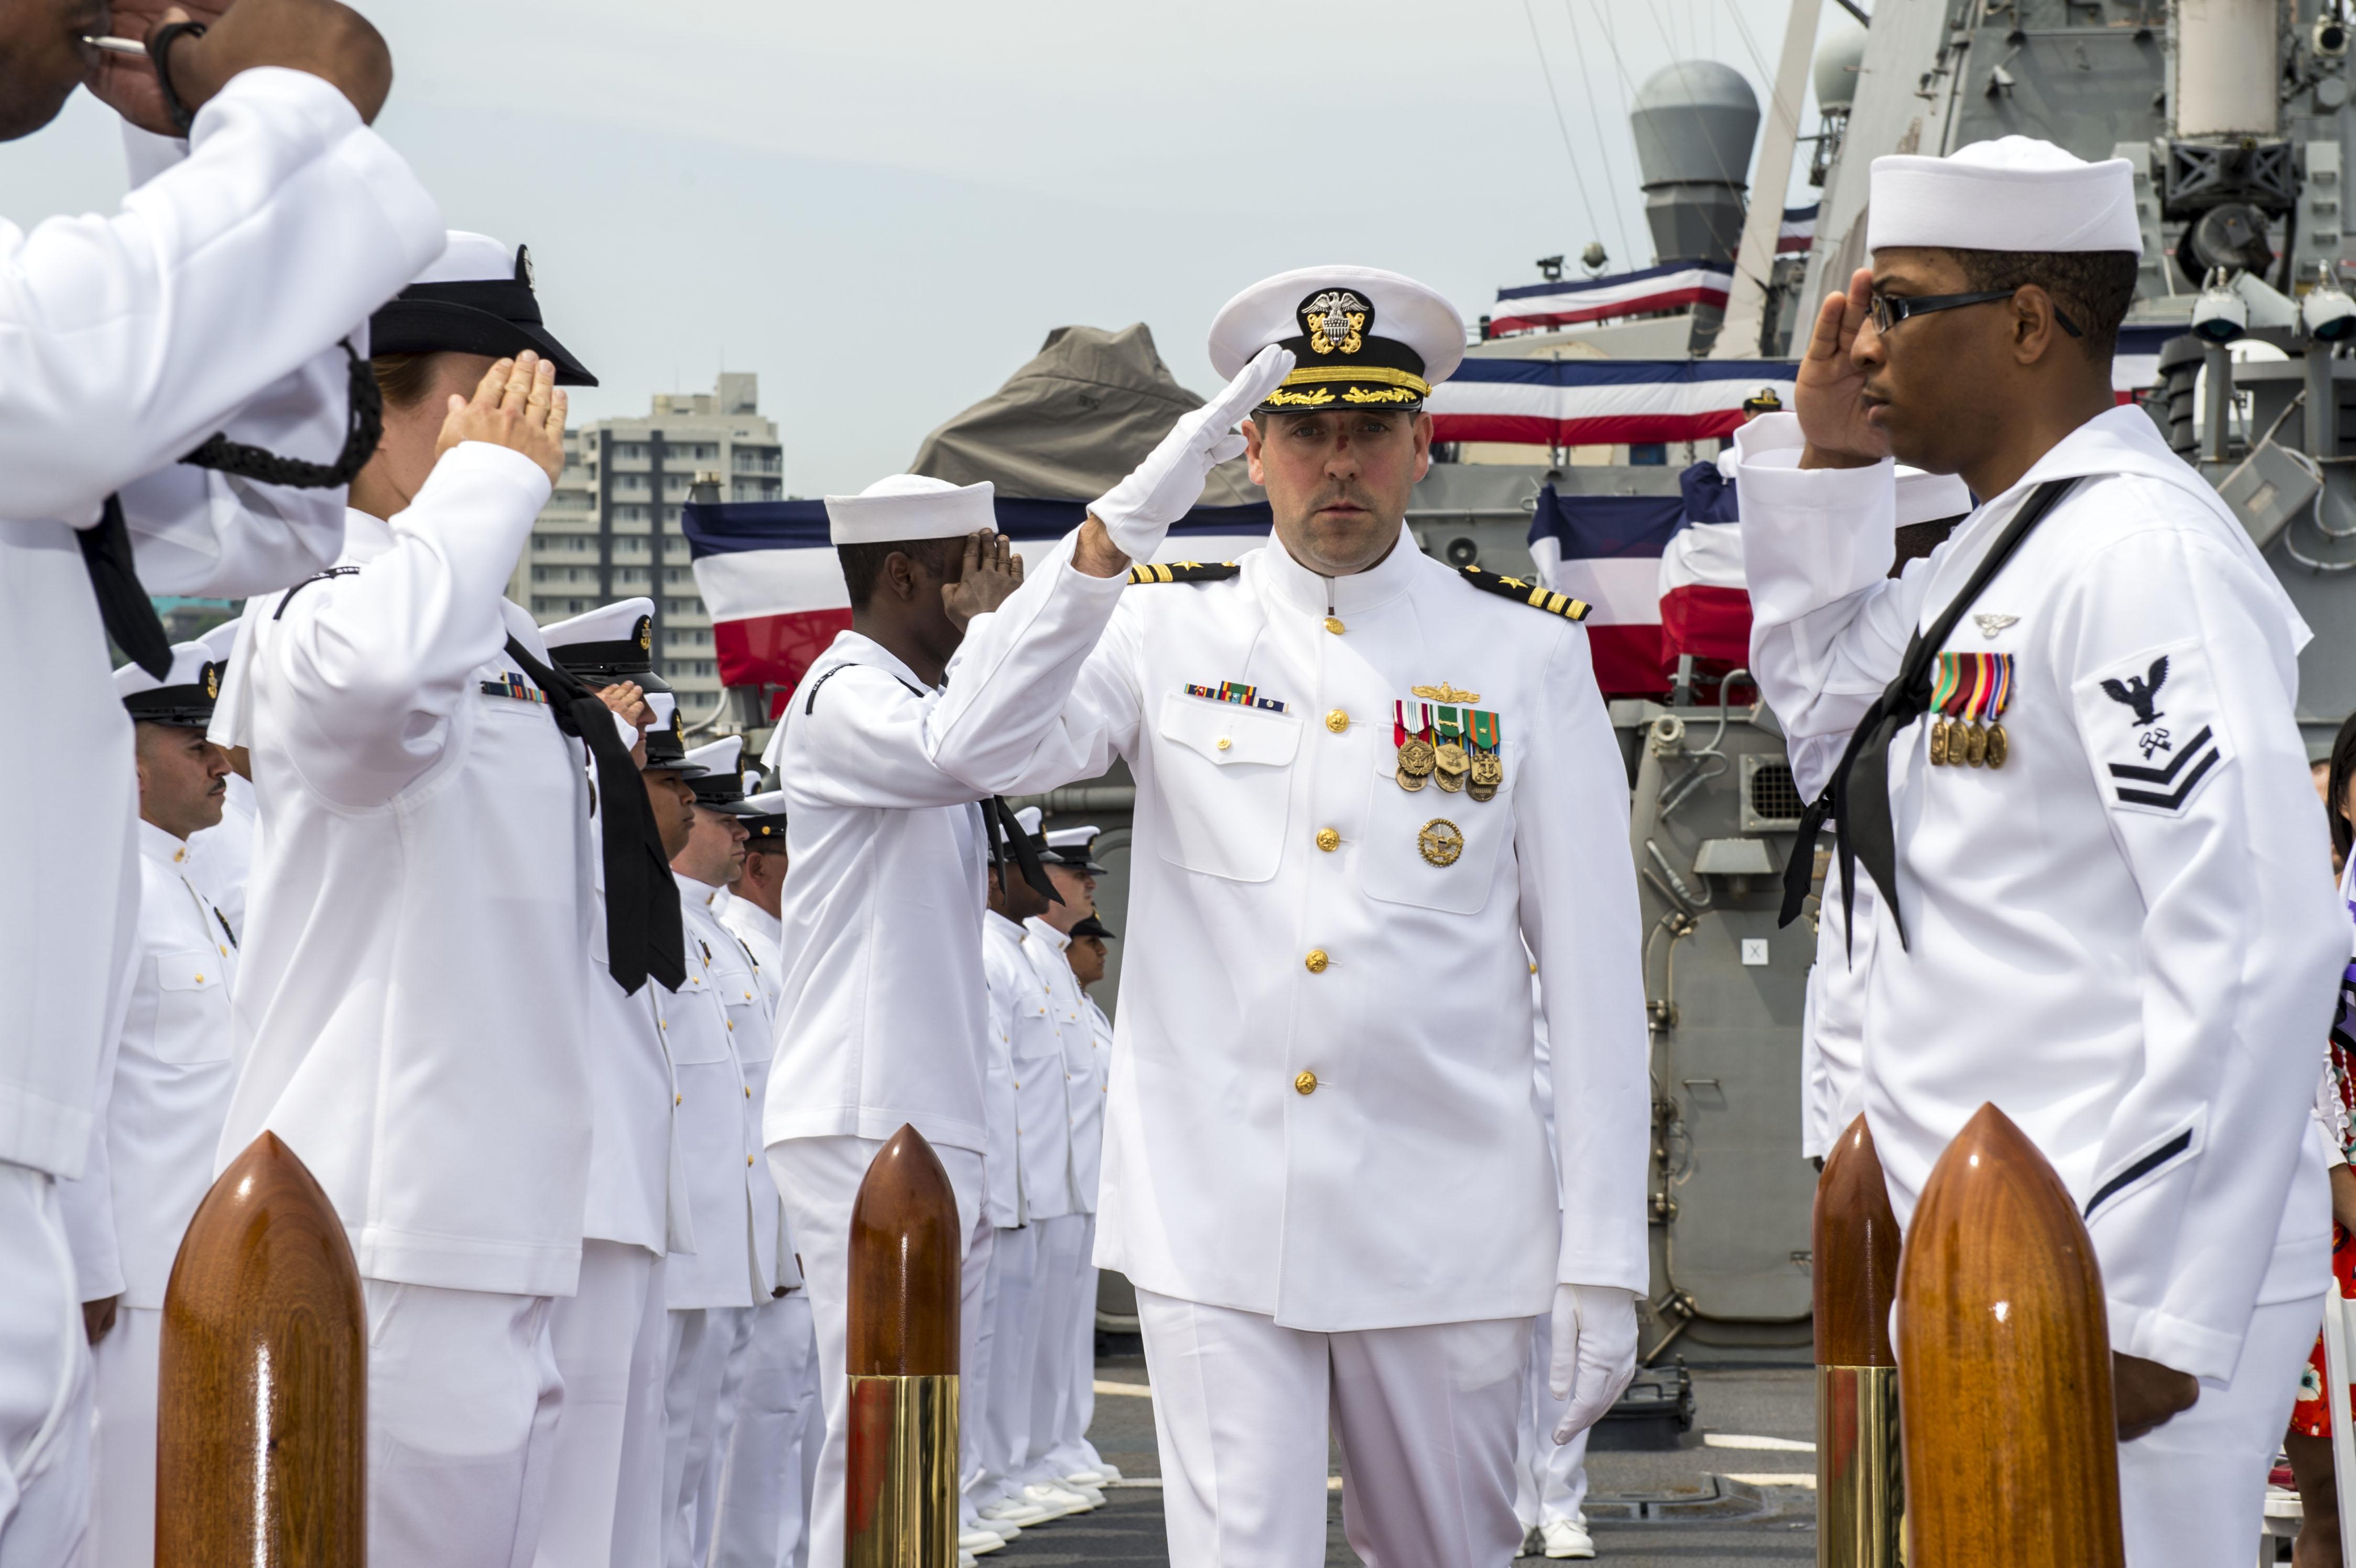 Stethem Bids Farewell, Welcomes New Commanding Officer